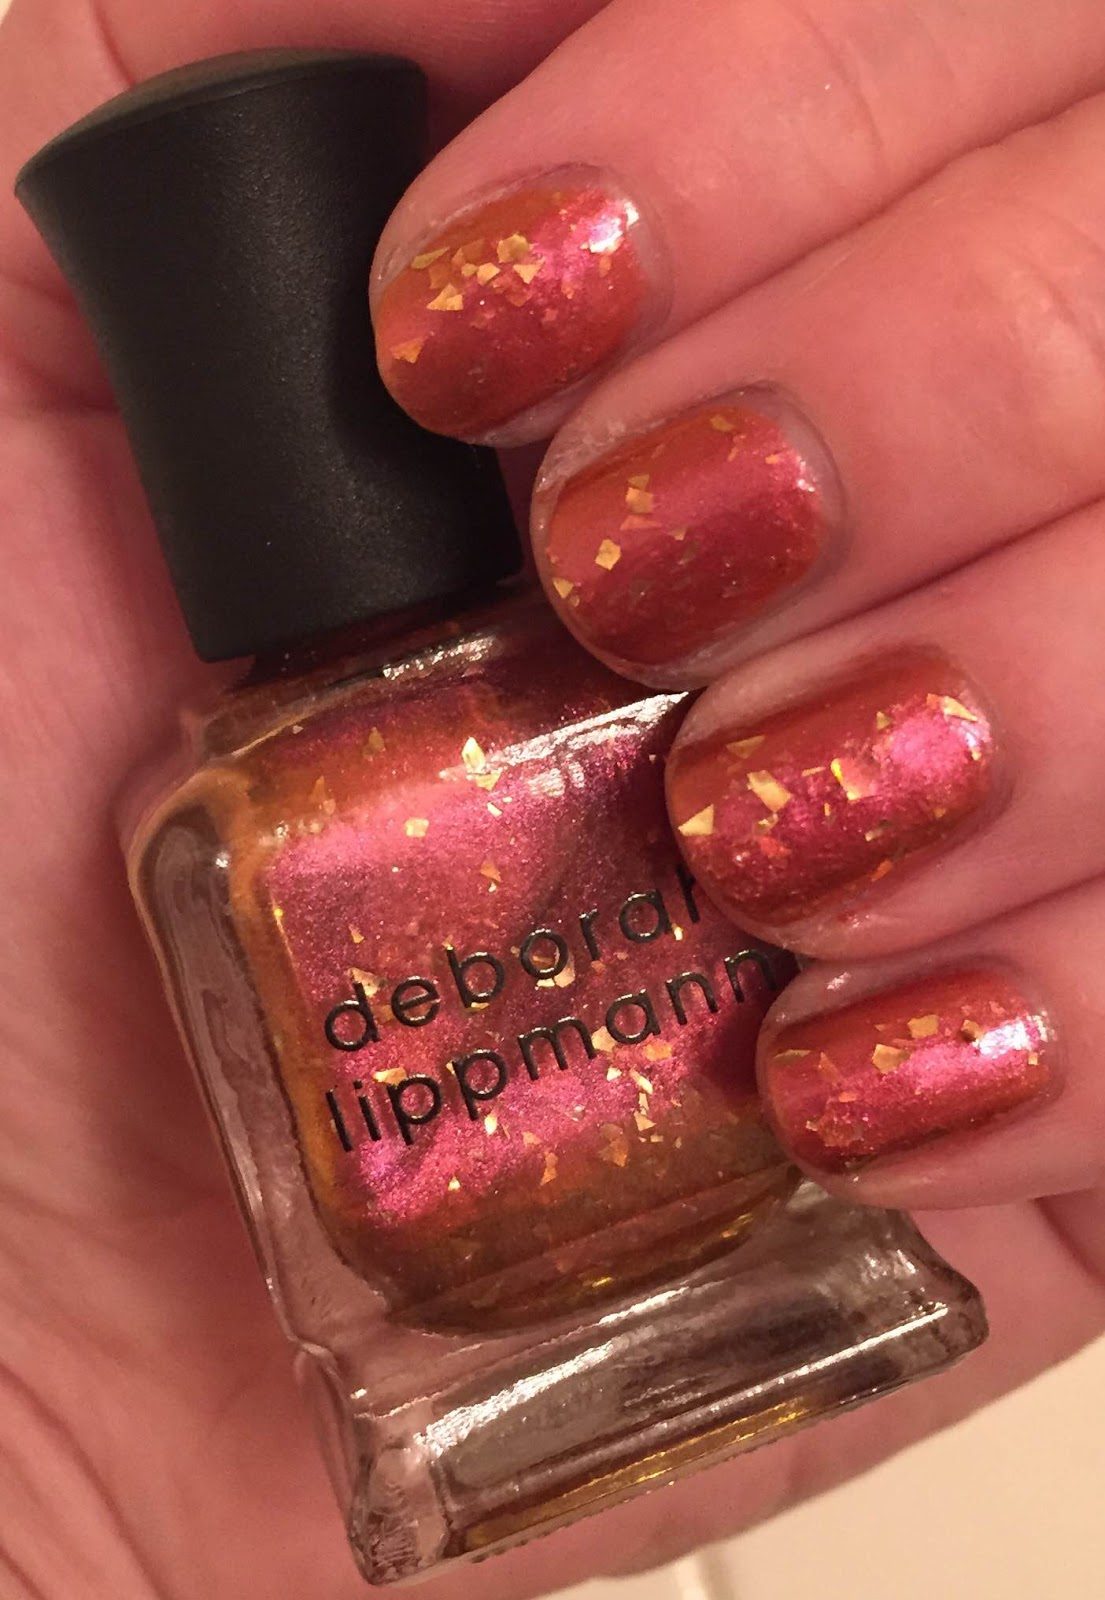 2019 year for women- Lippmann deborah fantastical holiday nail polish collection